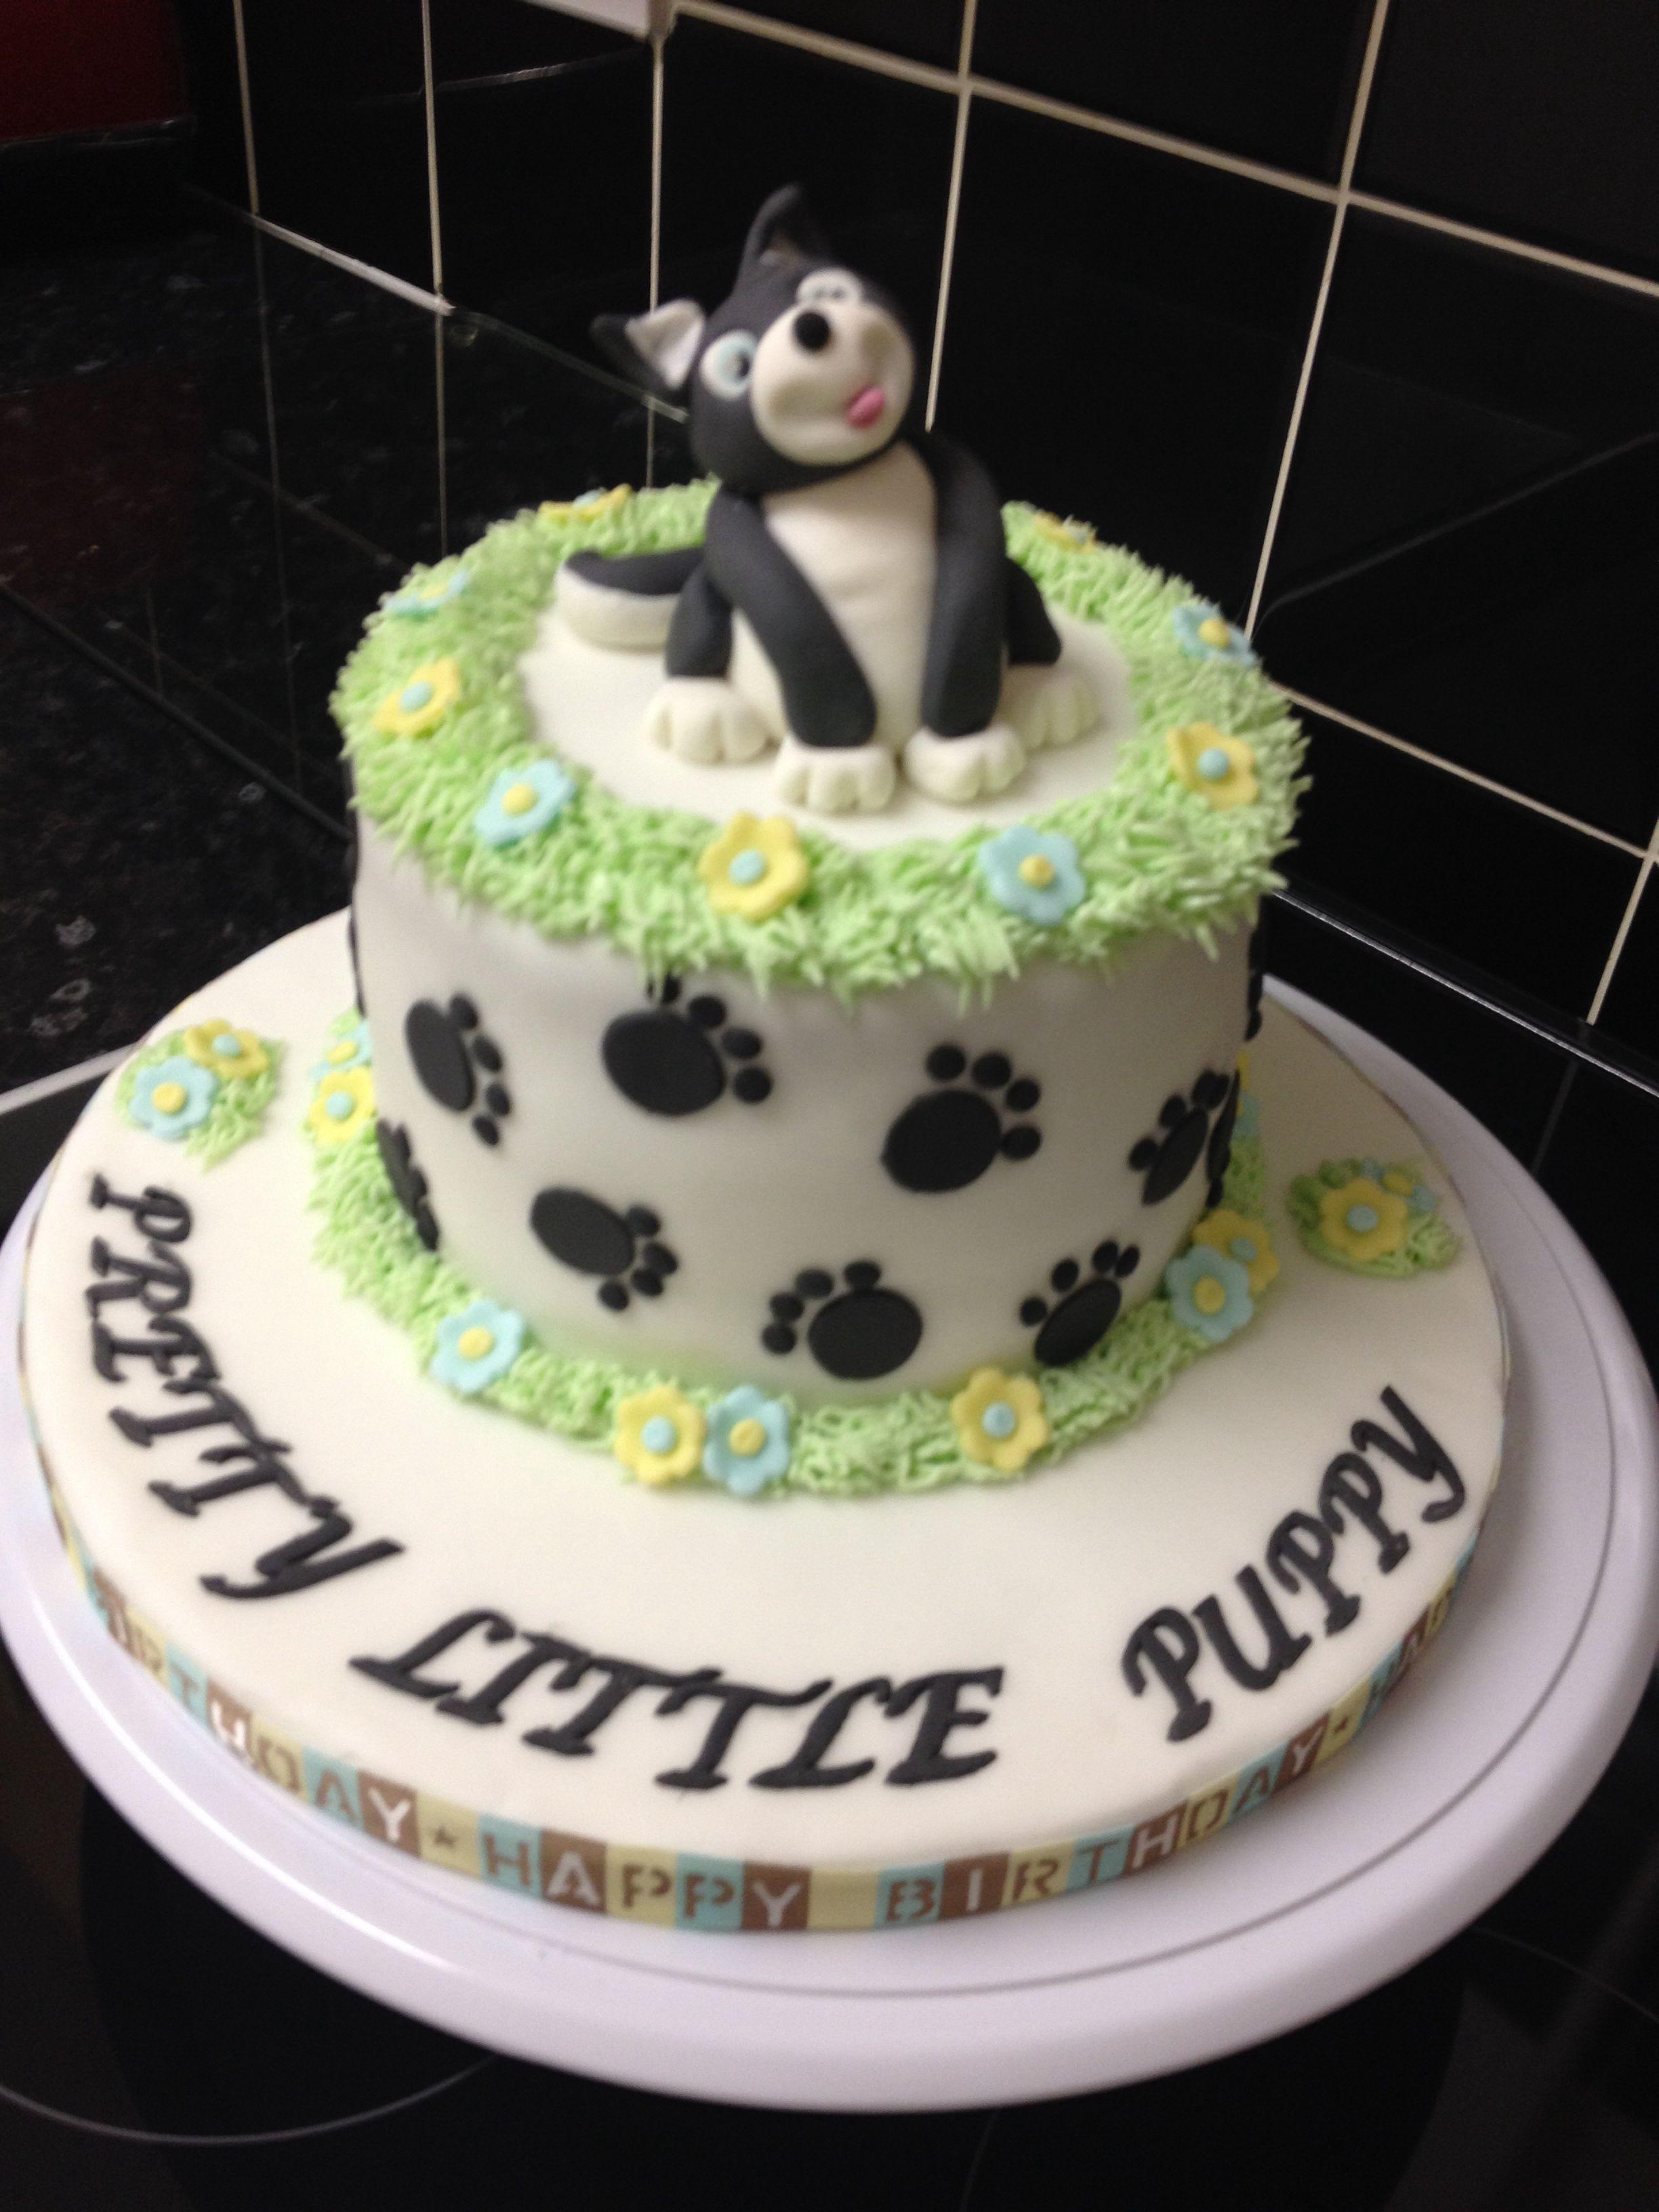 Doggy birthday cake with images cake birthday cake